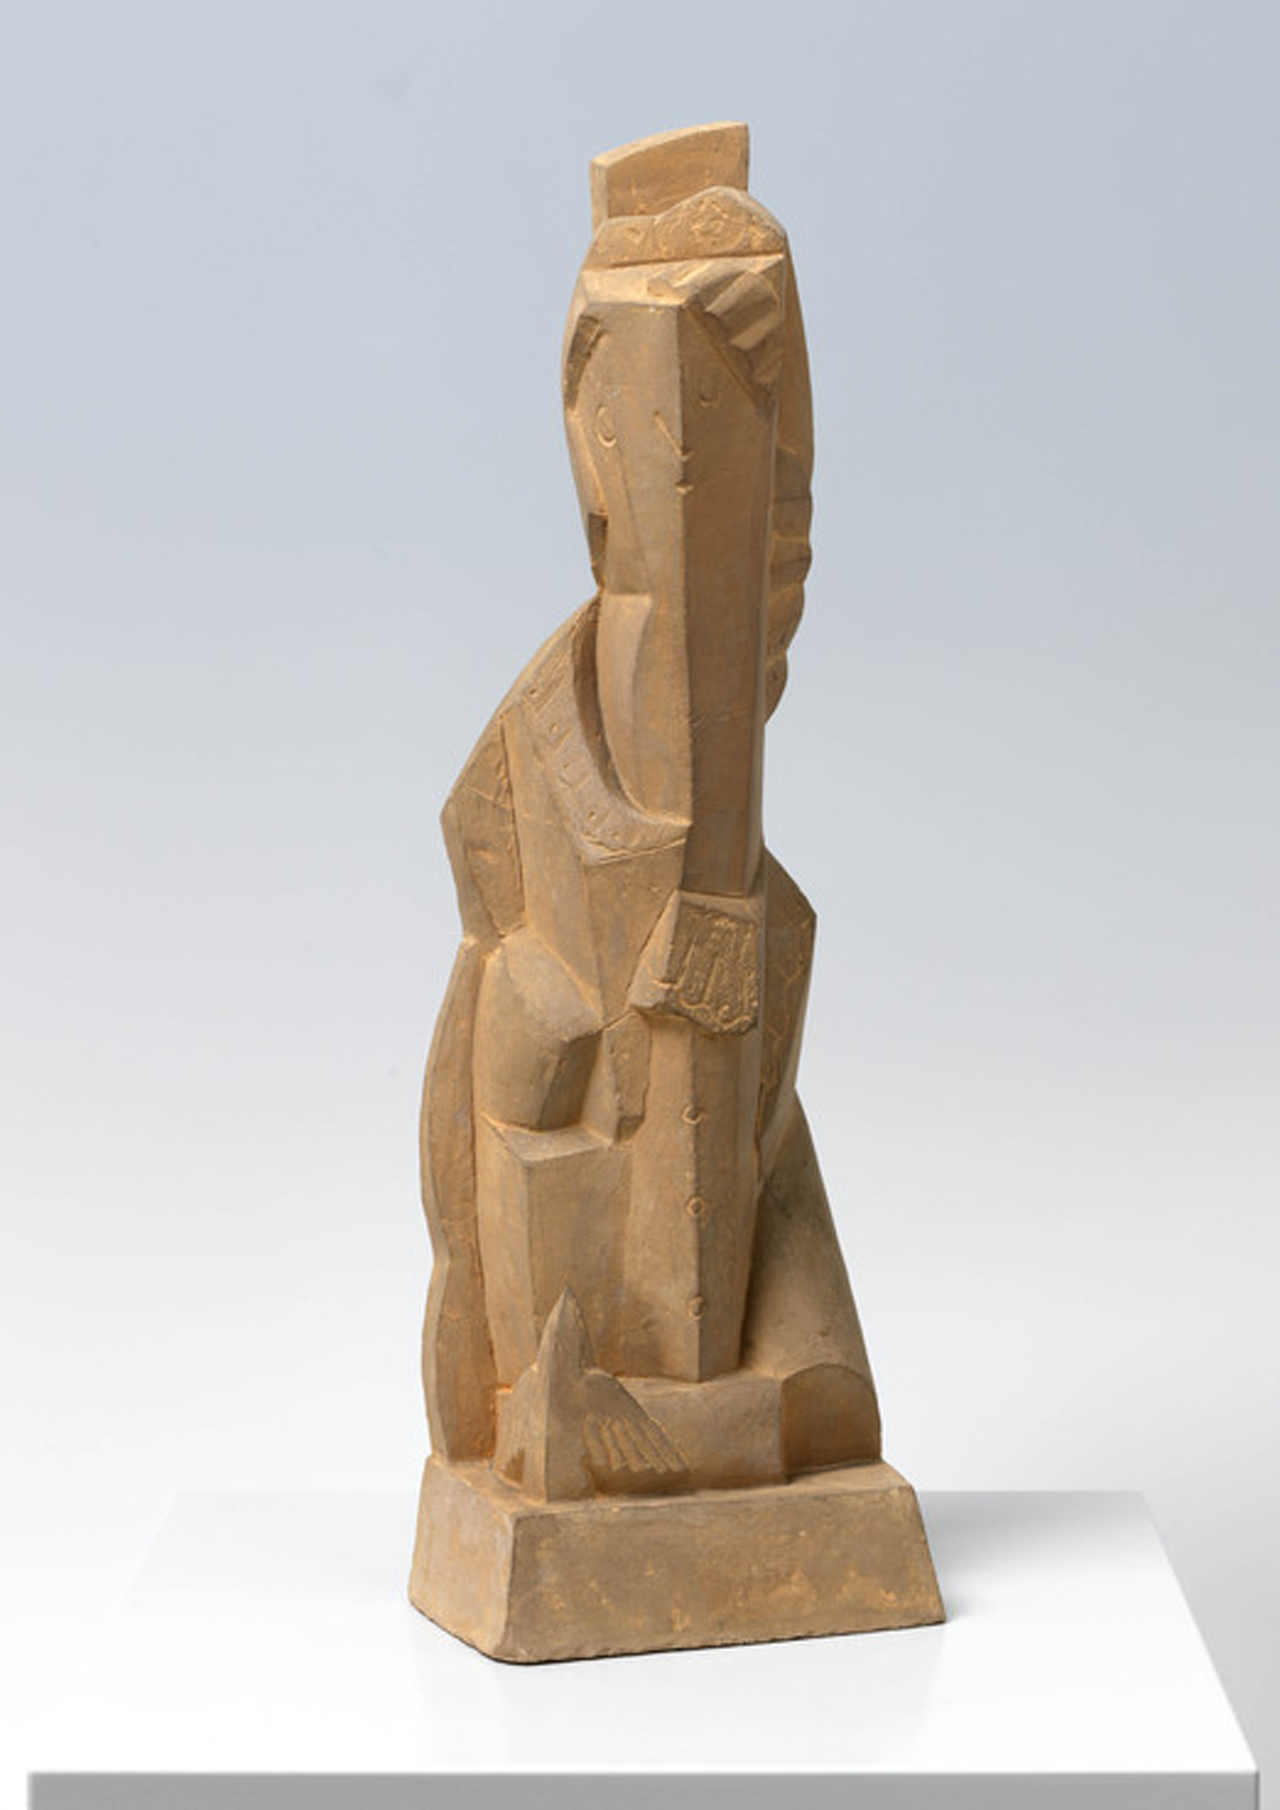 Henri Laurens, Femme à l'oiseau, 1921-1922, Terracotta, 34,3 x 11 x 7 cm